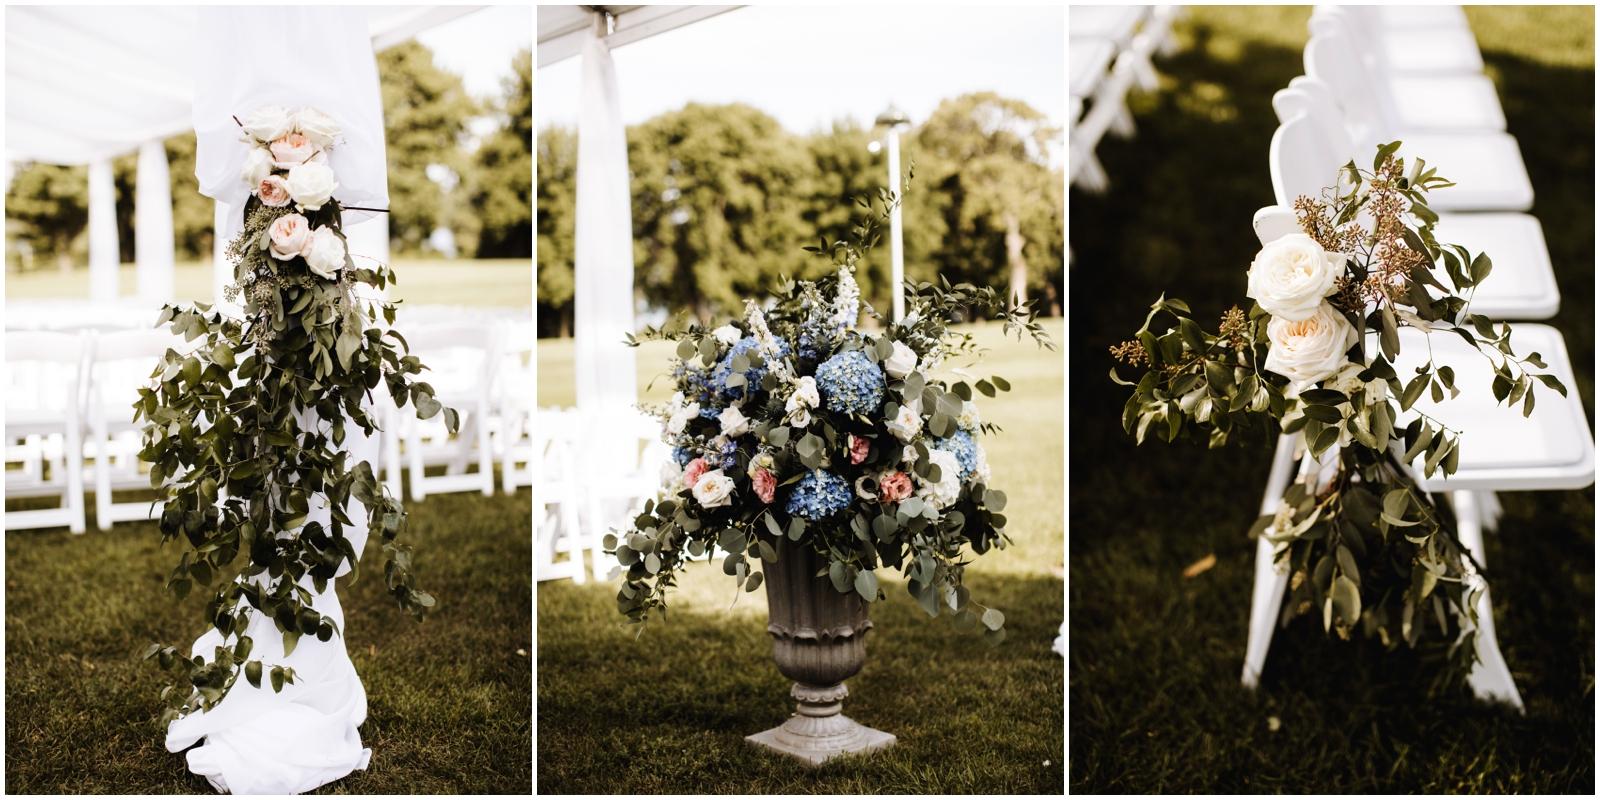 Minnesota Wedding Planner. Lafayette Club Wedding. Outdoor wedding ceremony decor